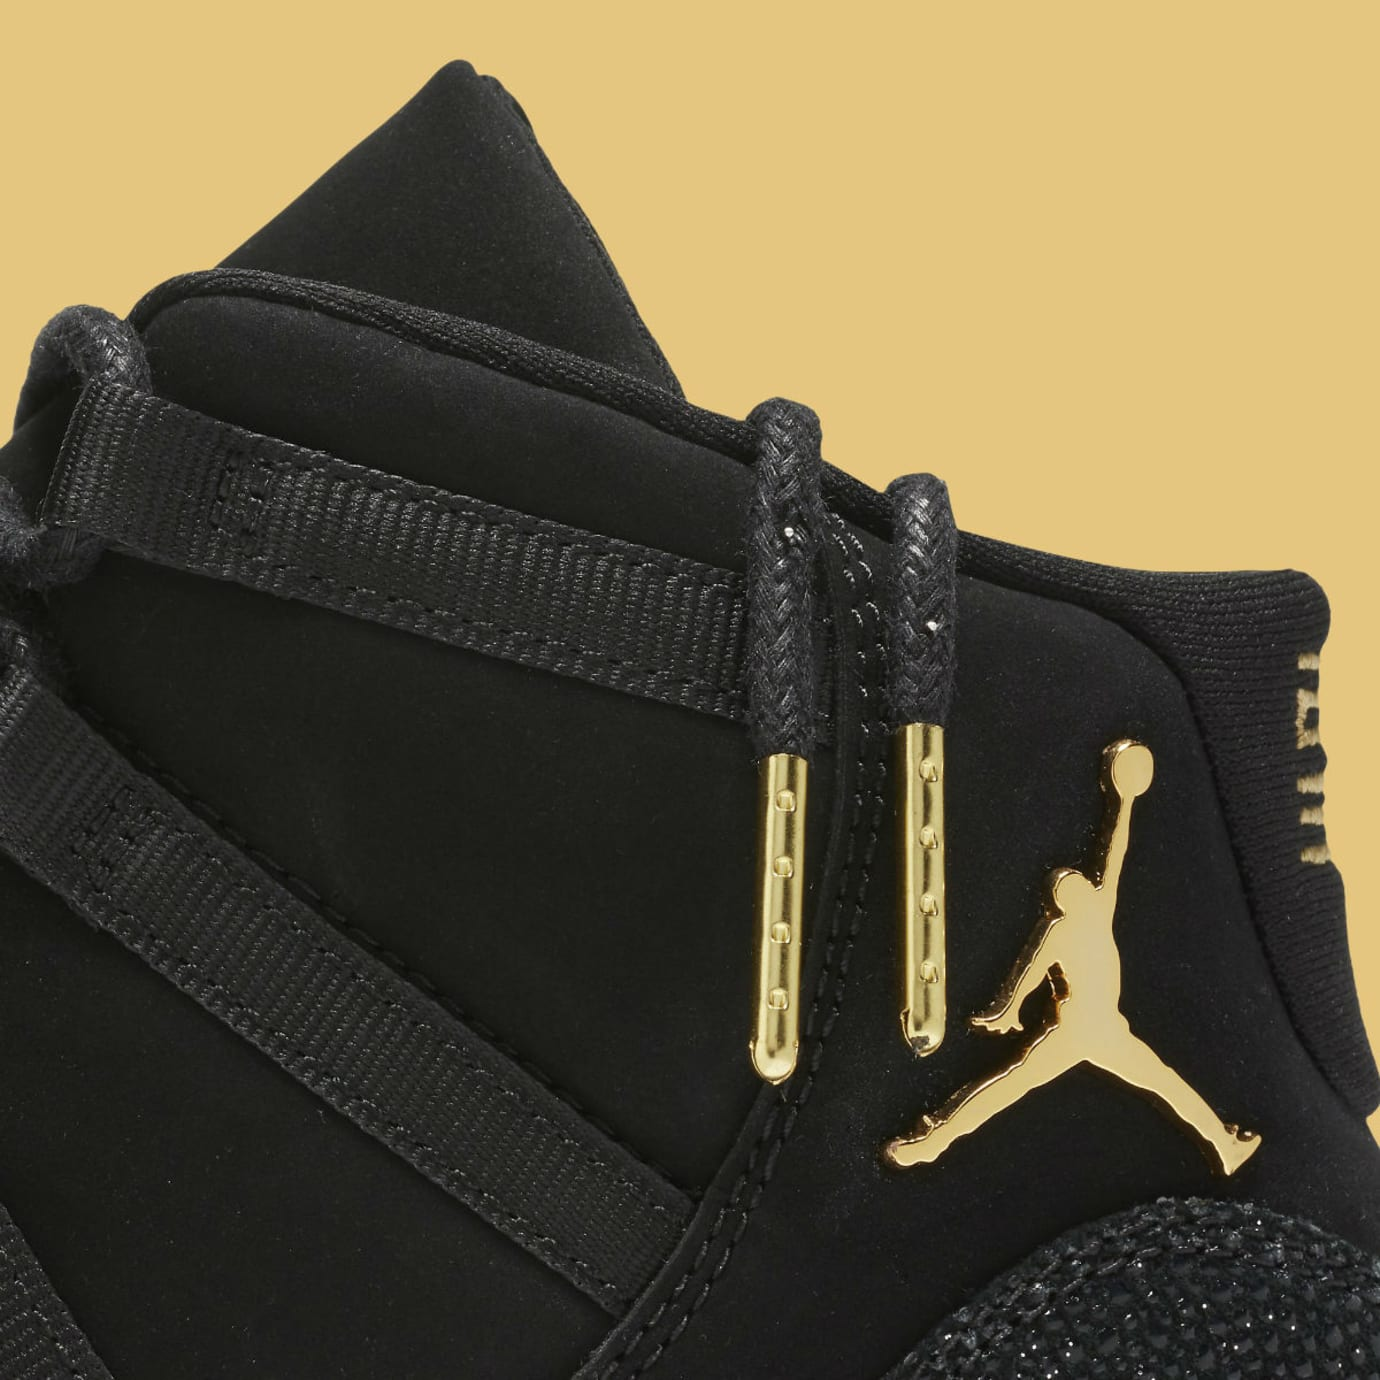 d7b53ec1256 Air Jordan 11 XI Heiress Collection Black Gold Release Date 852625 ...